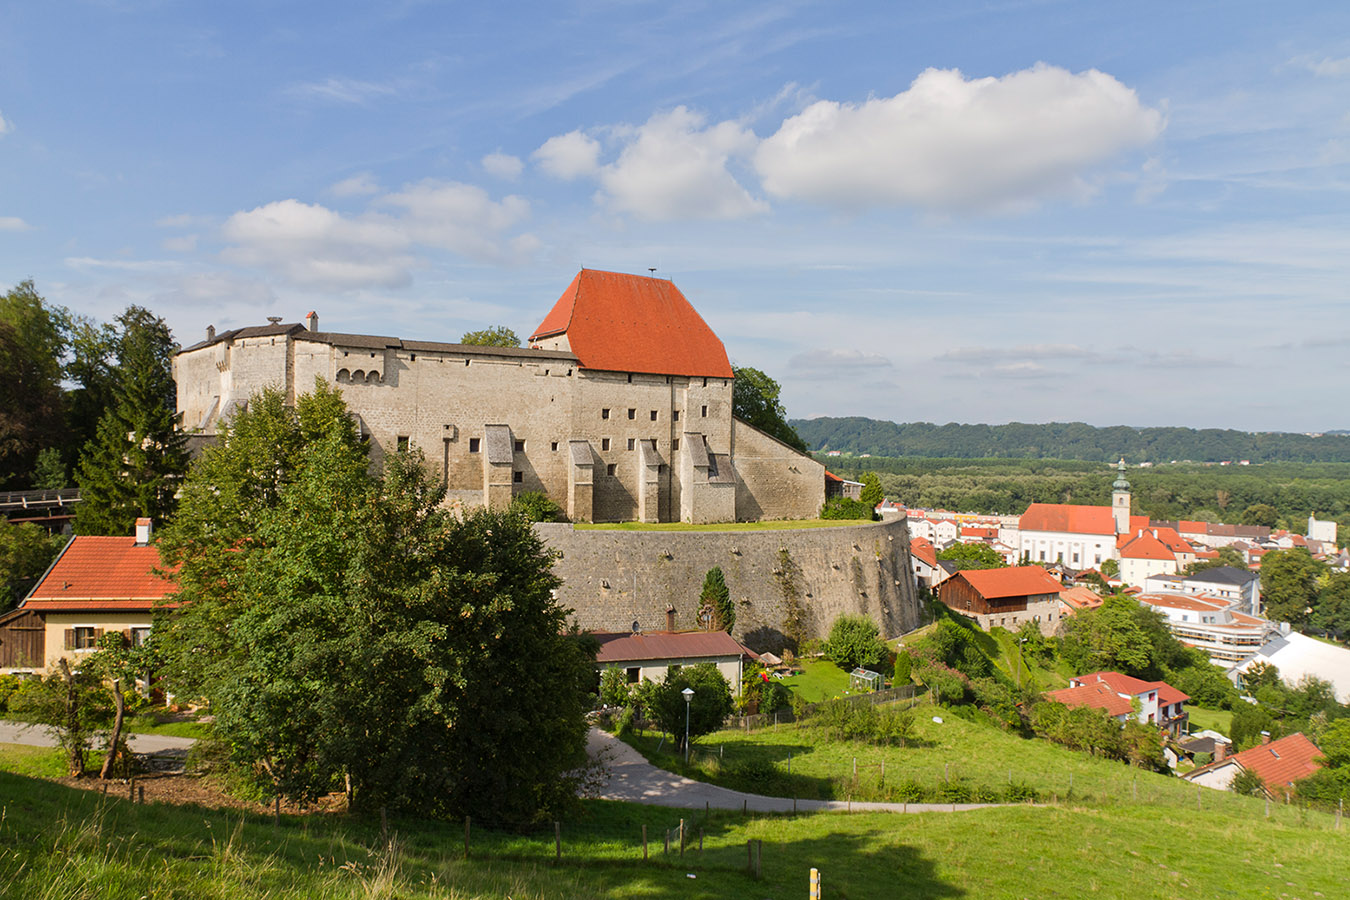 Tittmoning Burg und Altstadt